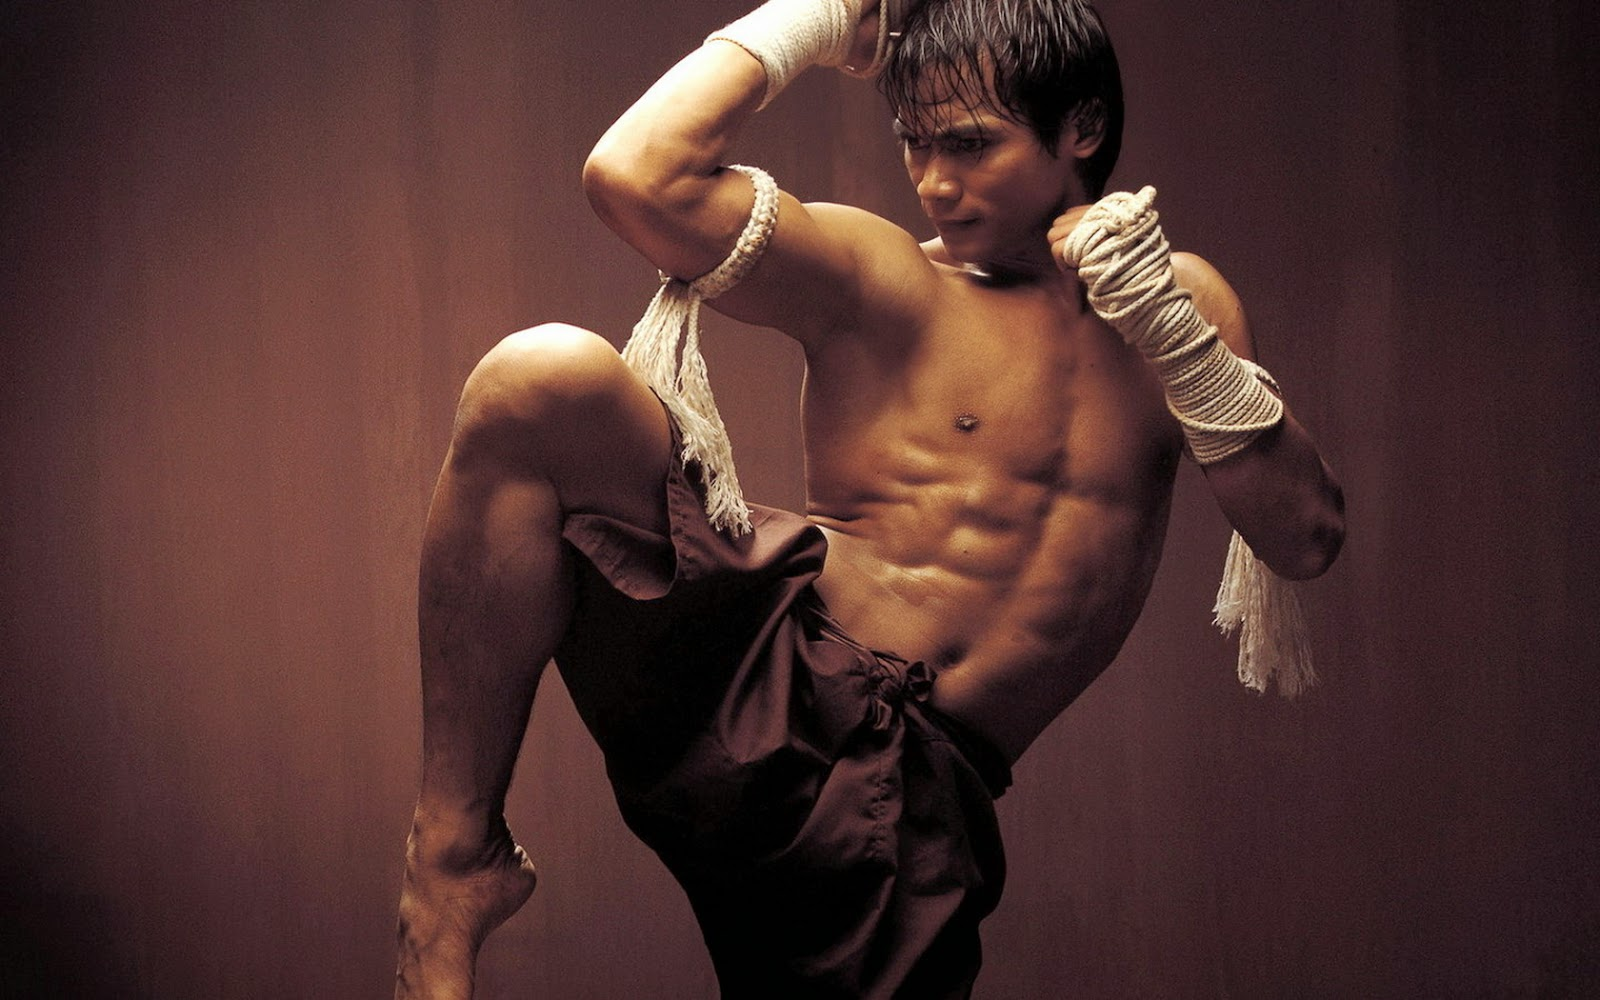 Thai boxing muai thai ong bak photo images wallpaper